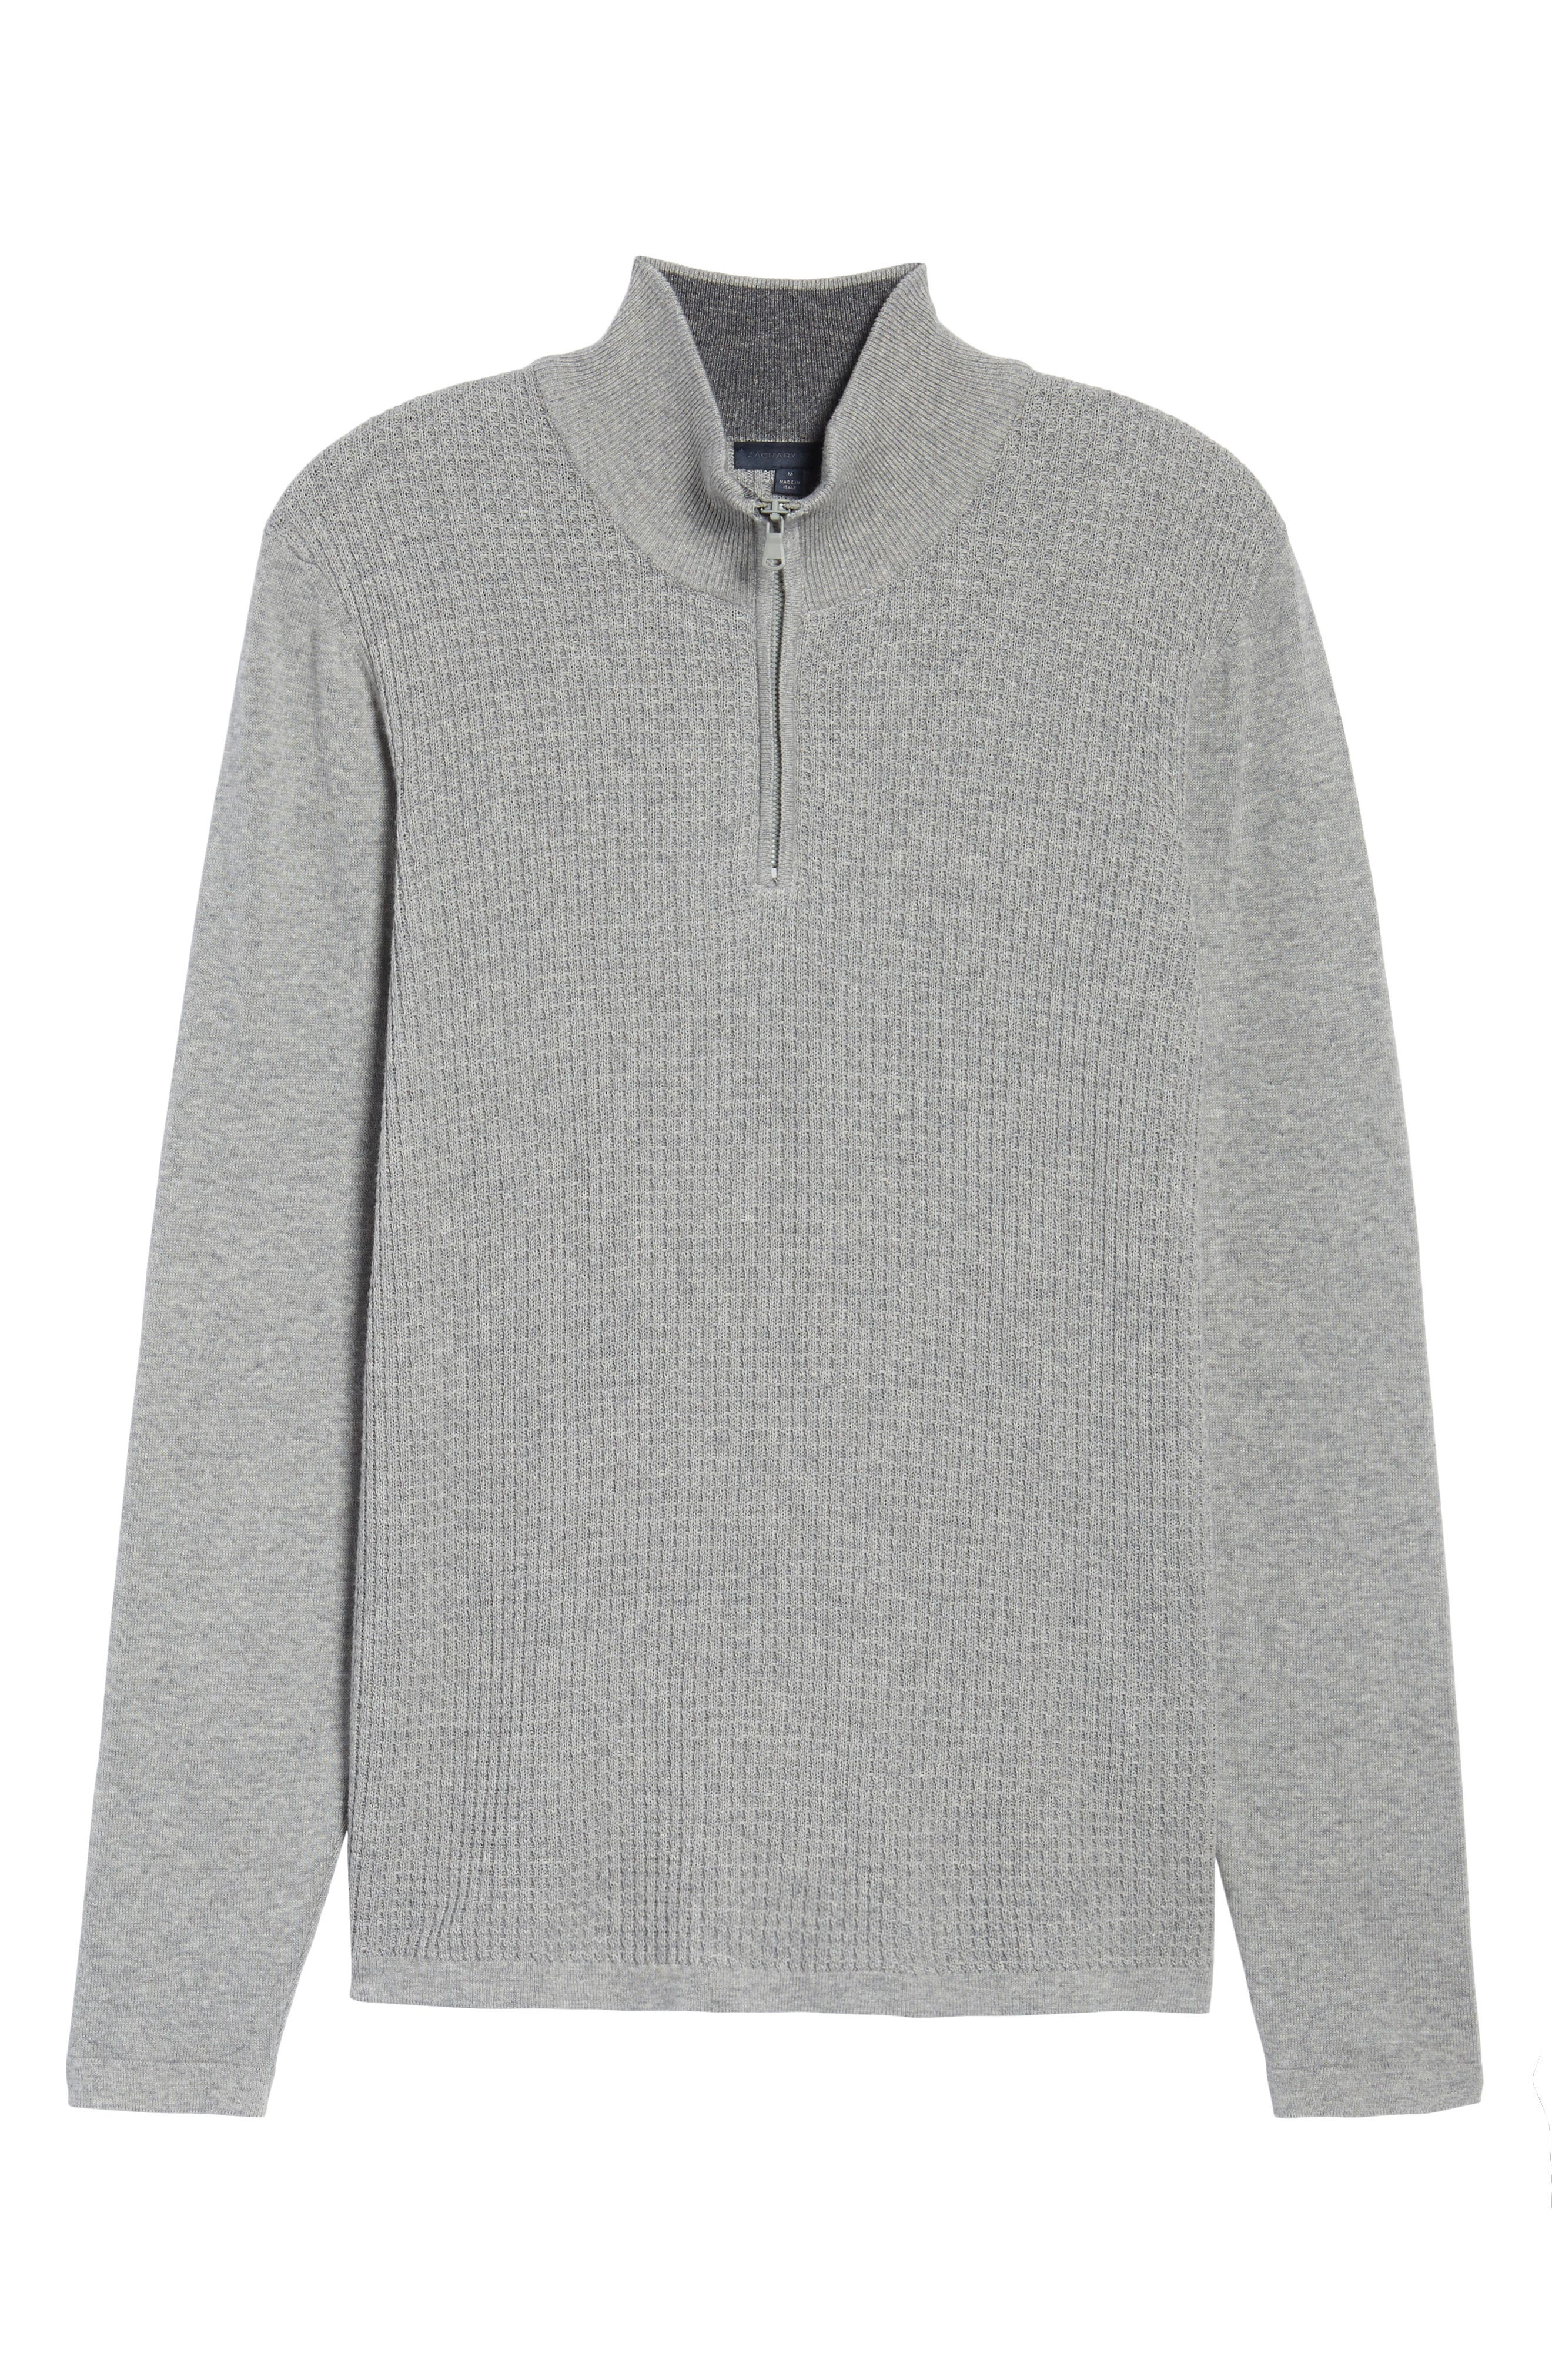 Higgins Quarter Zip Sweater,                             Alternate thumbnail 6, color,                             050